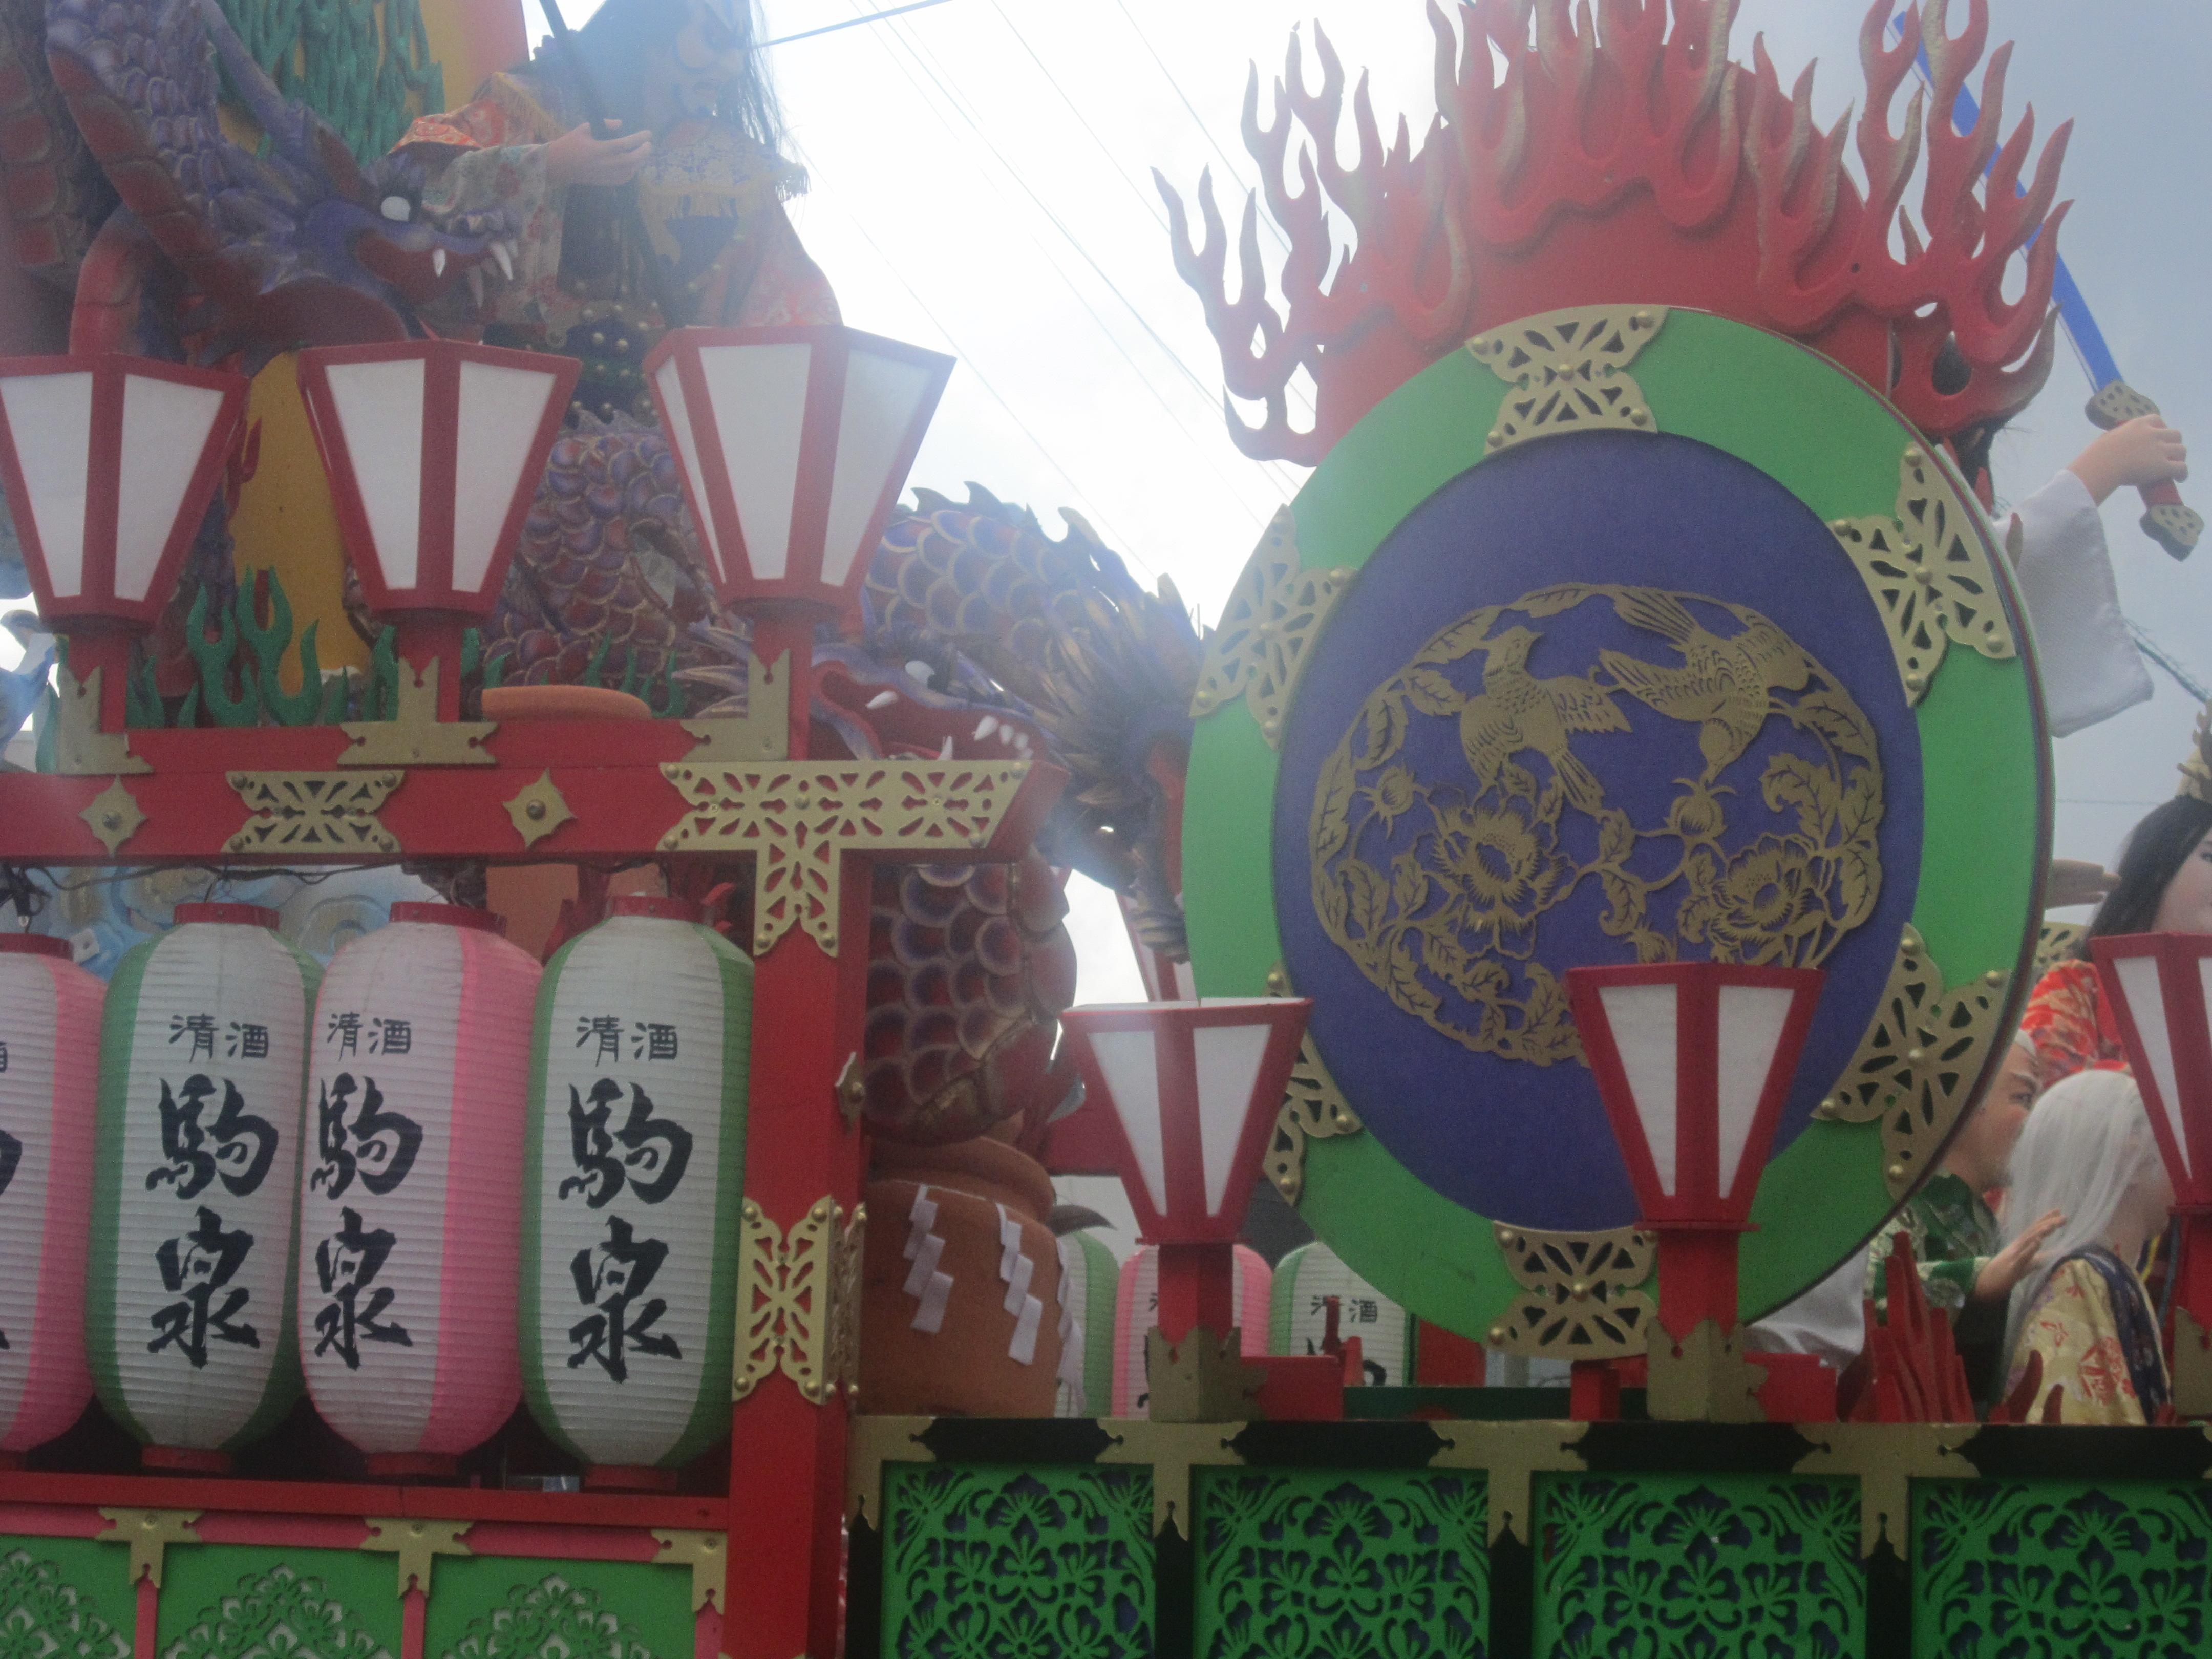 IMG 4243 - 麻布十番納涼祭り25,26日(七戸町出店)